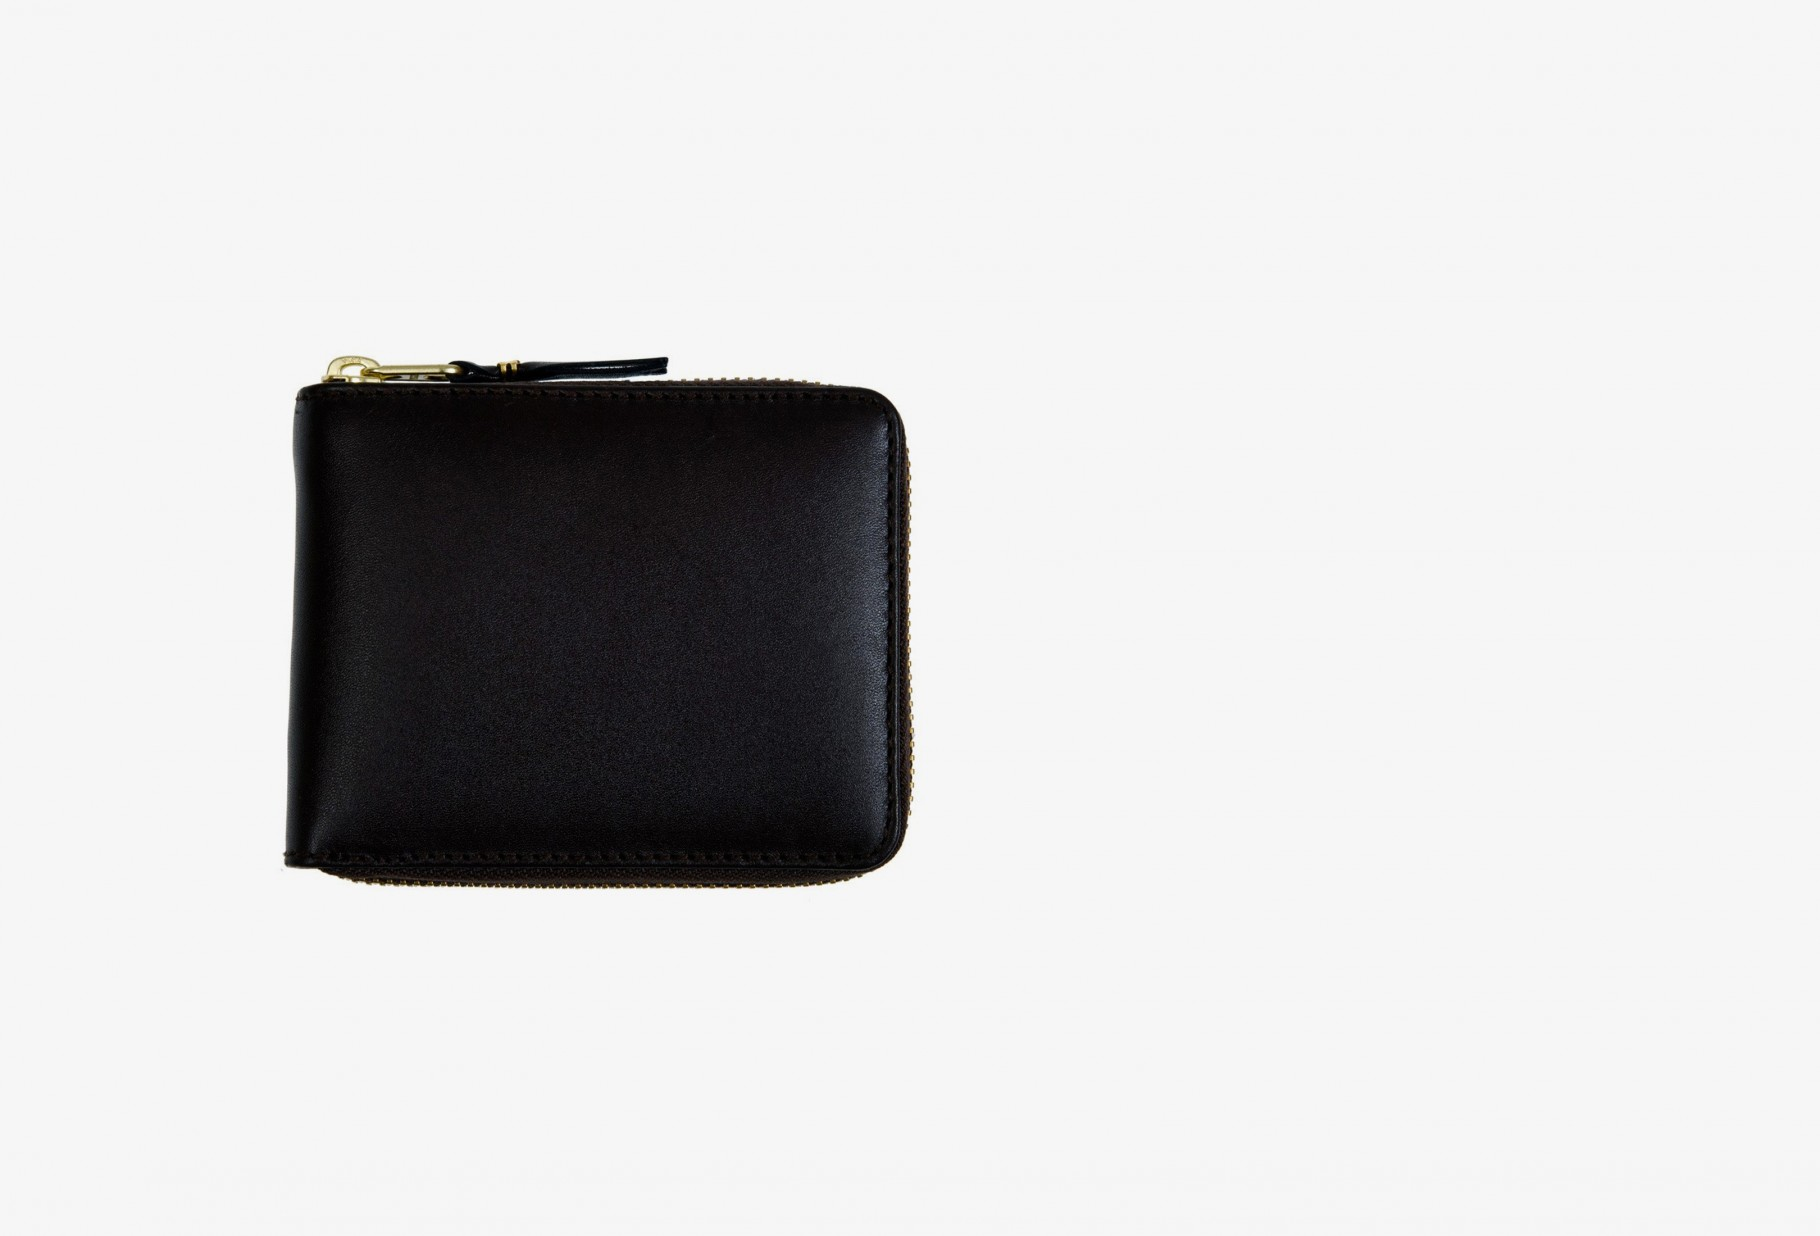 CDG WALLETS / Cdg classic leather sa7100 Black